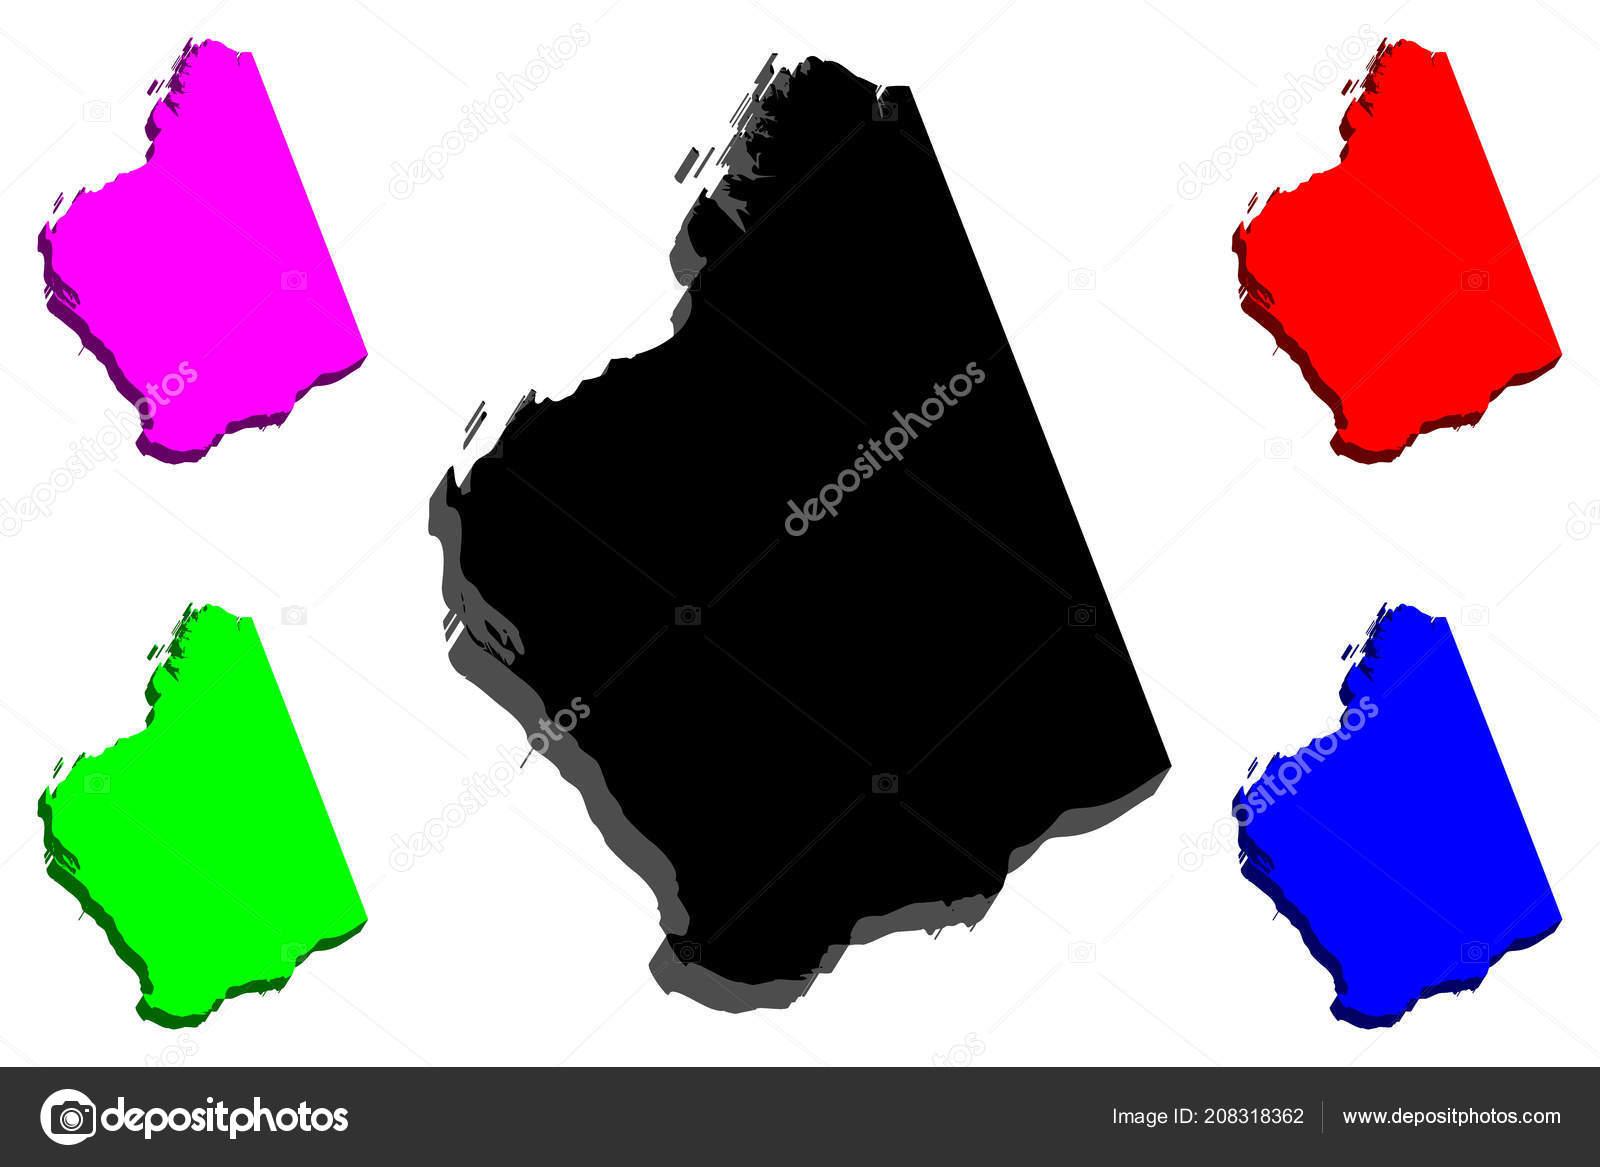 Australia Map States And Territories.Map Western Australia Australian States Territories Black Red Purple